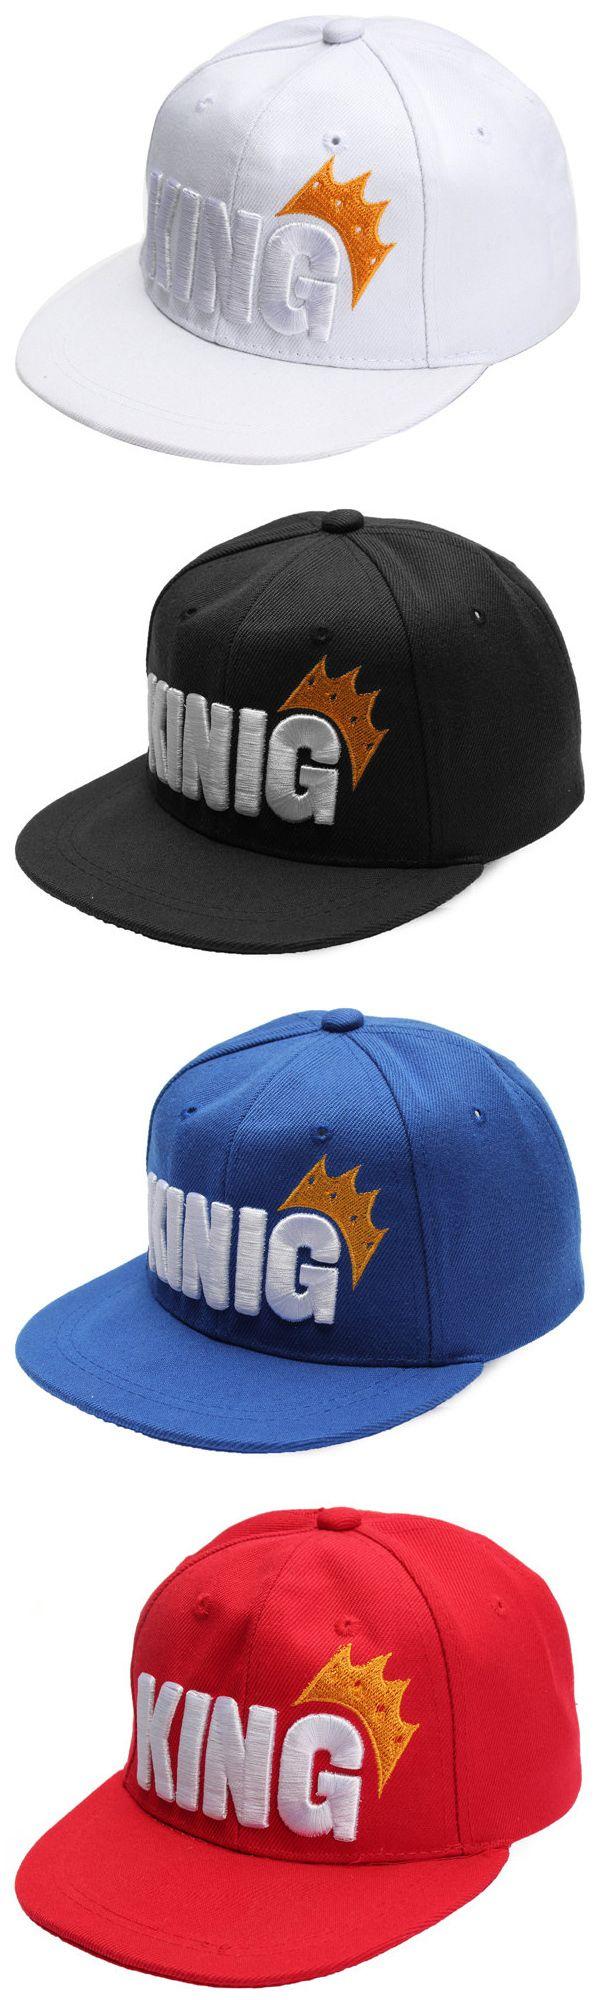 ec870809ee1 US 7.54 Children Kids Boys Girls King Crown Flat Brimmed Baseball Cap  Snapback Hip Hop Hat kids  hats  summer